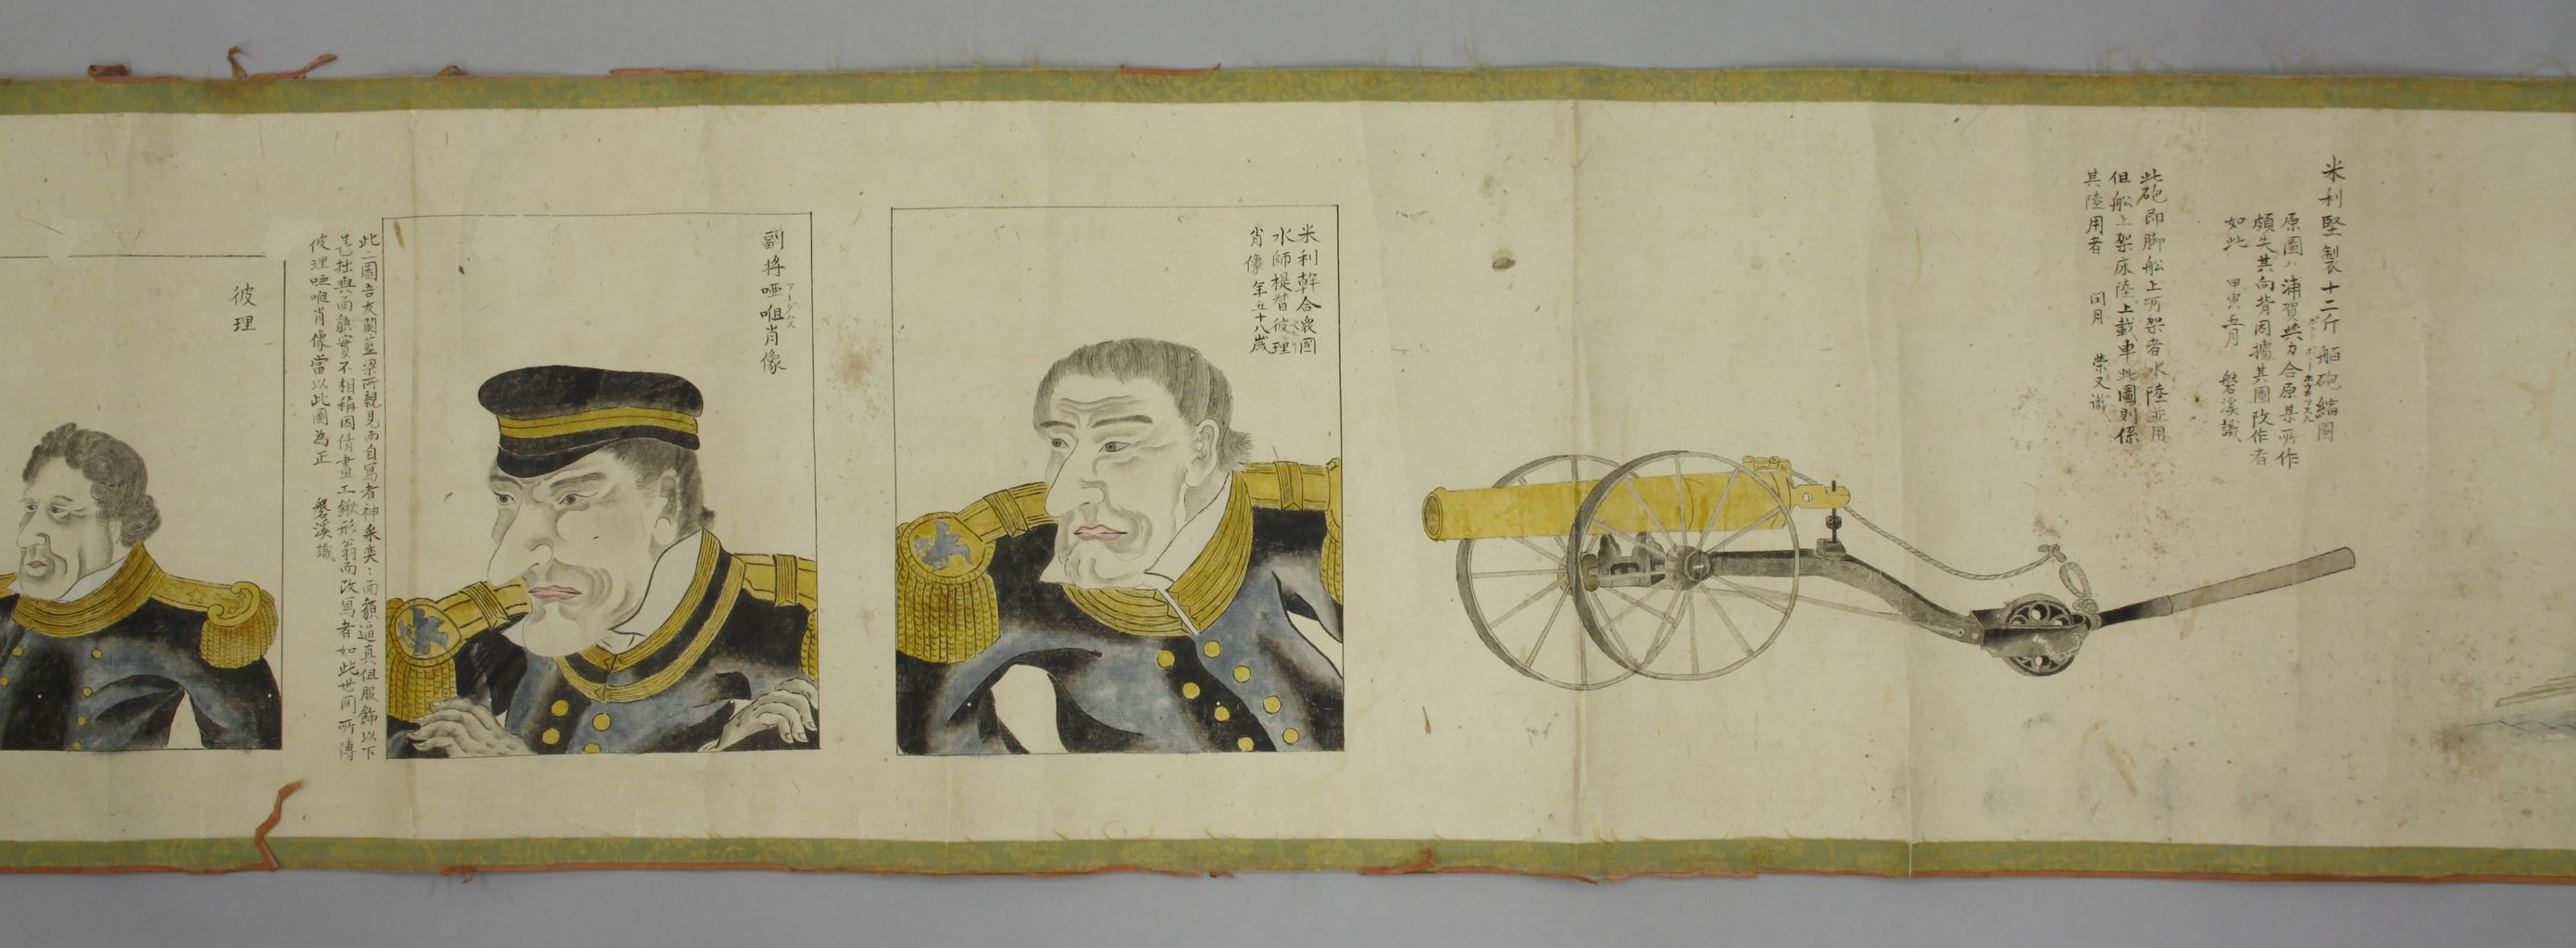 zzz ko 金海奇観 ペリー来航巻4 最低価格 ¥2,000,000~ 455×25cm